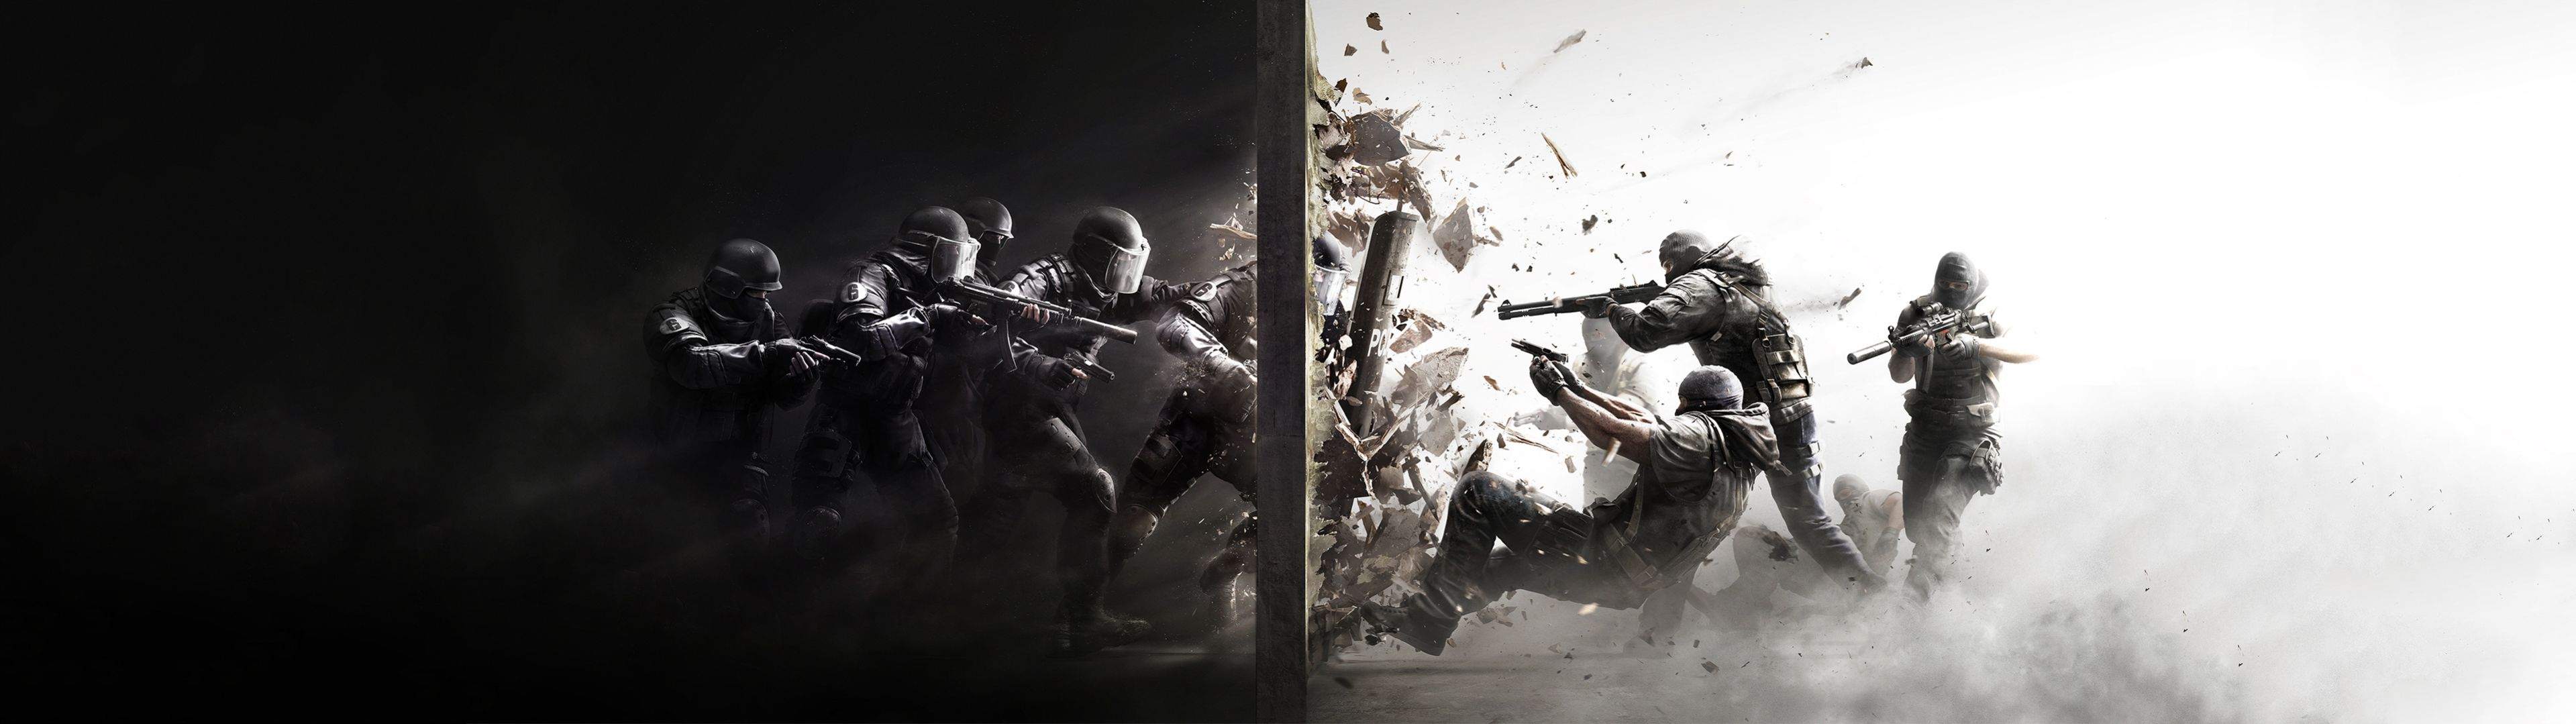 Counter Strike Dual Screen Wallpaper | 3839x1079 | ID:43751